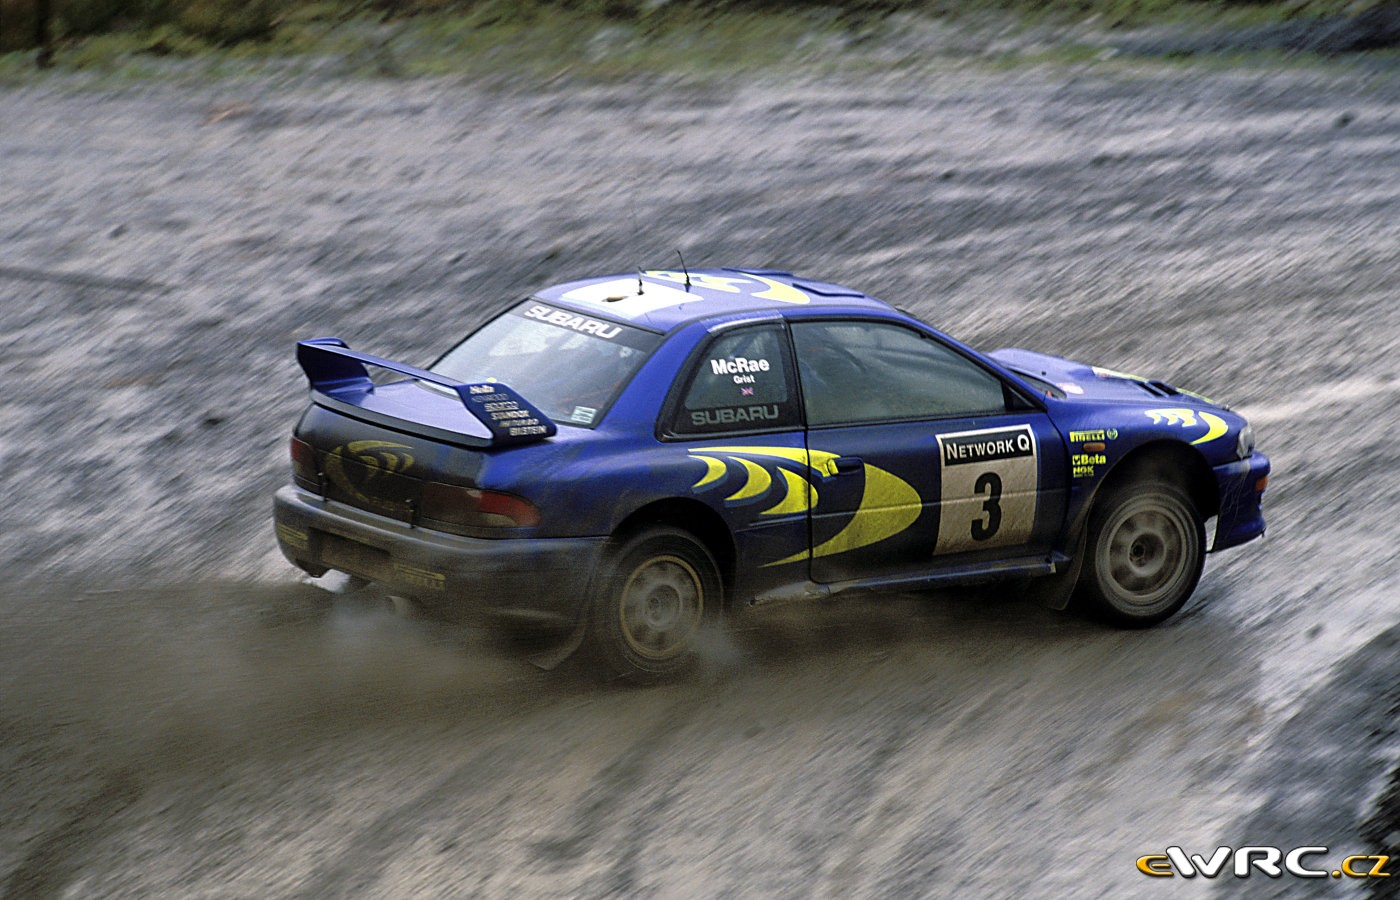 1997-14racrally-colinmcraenickygrist02